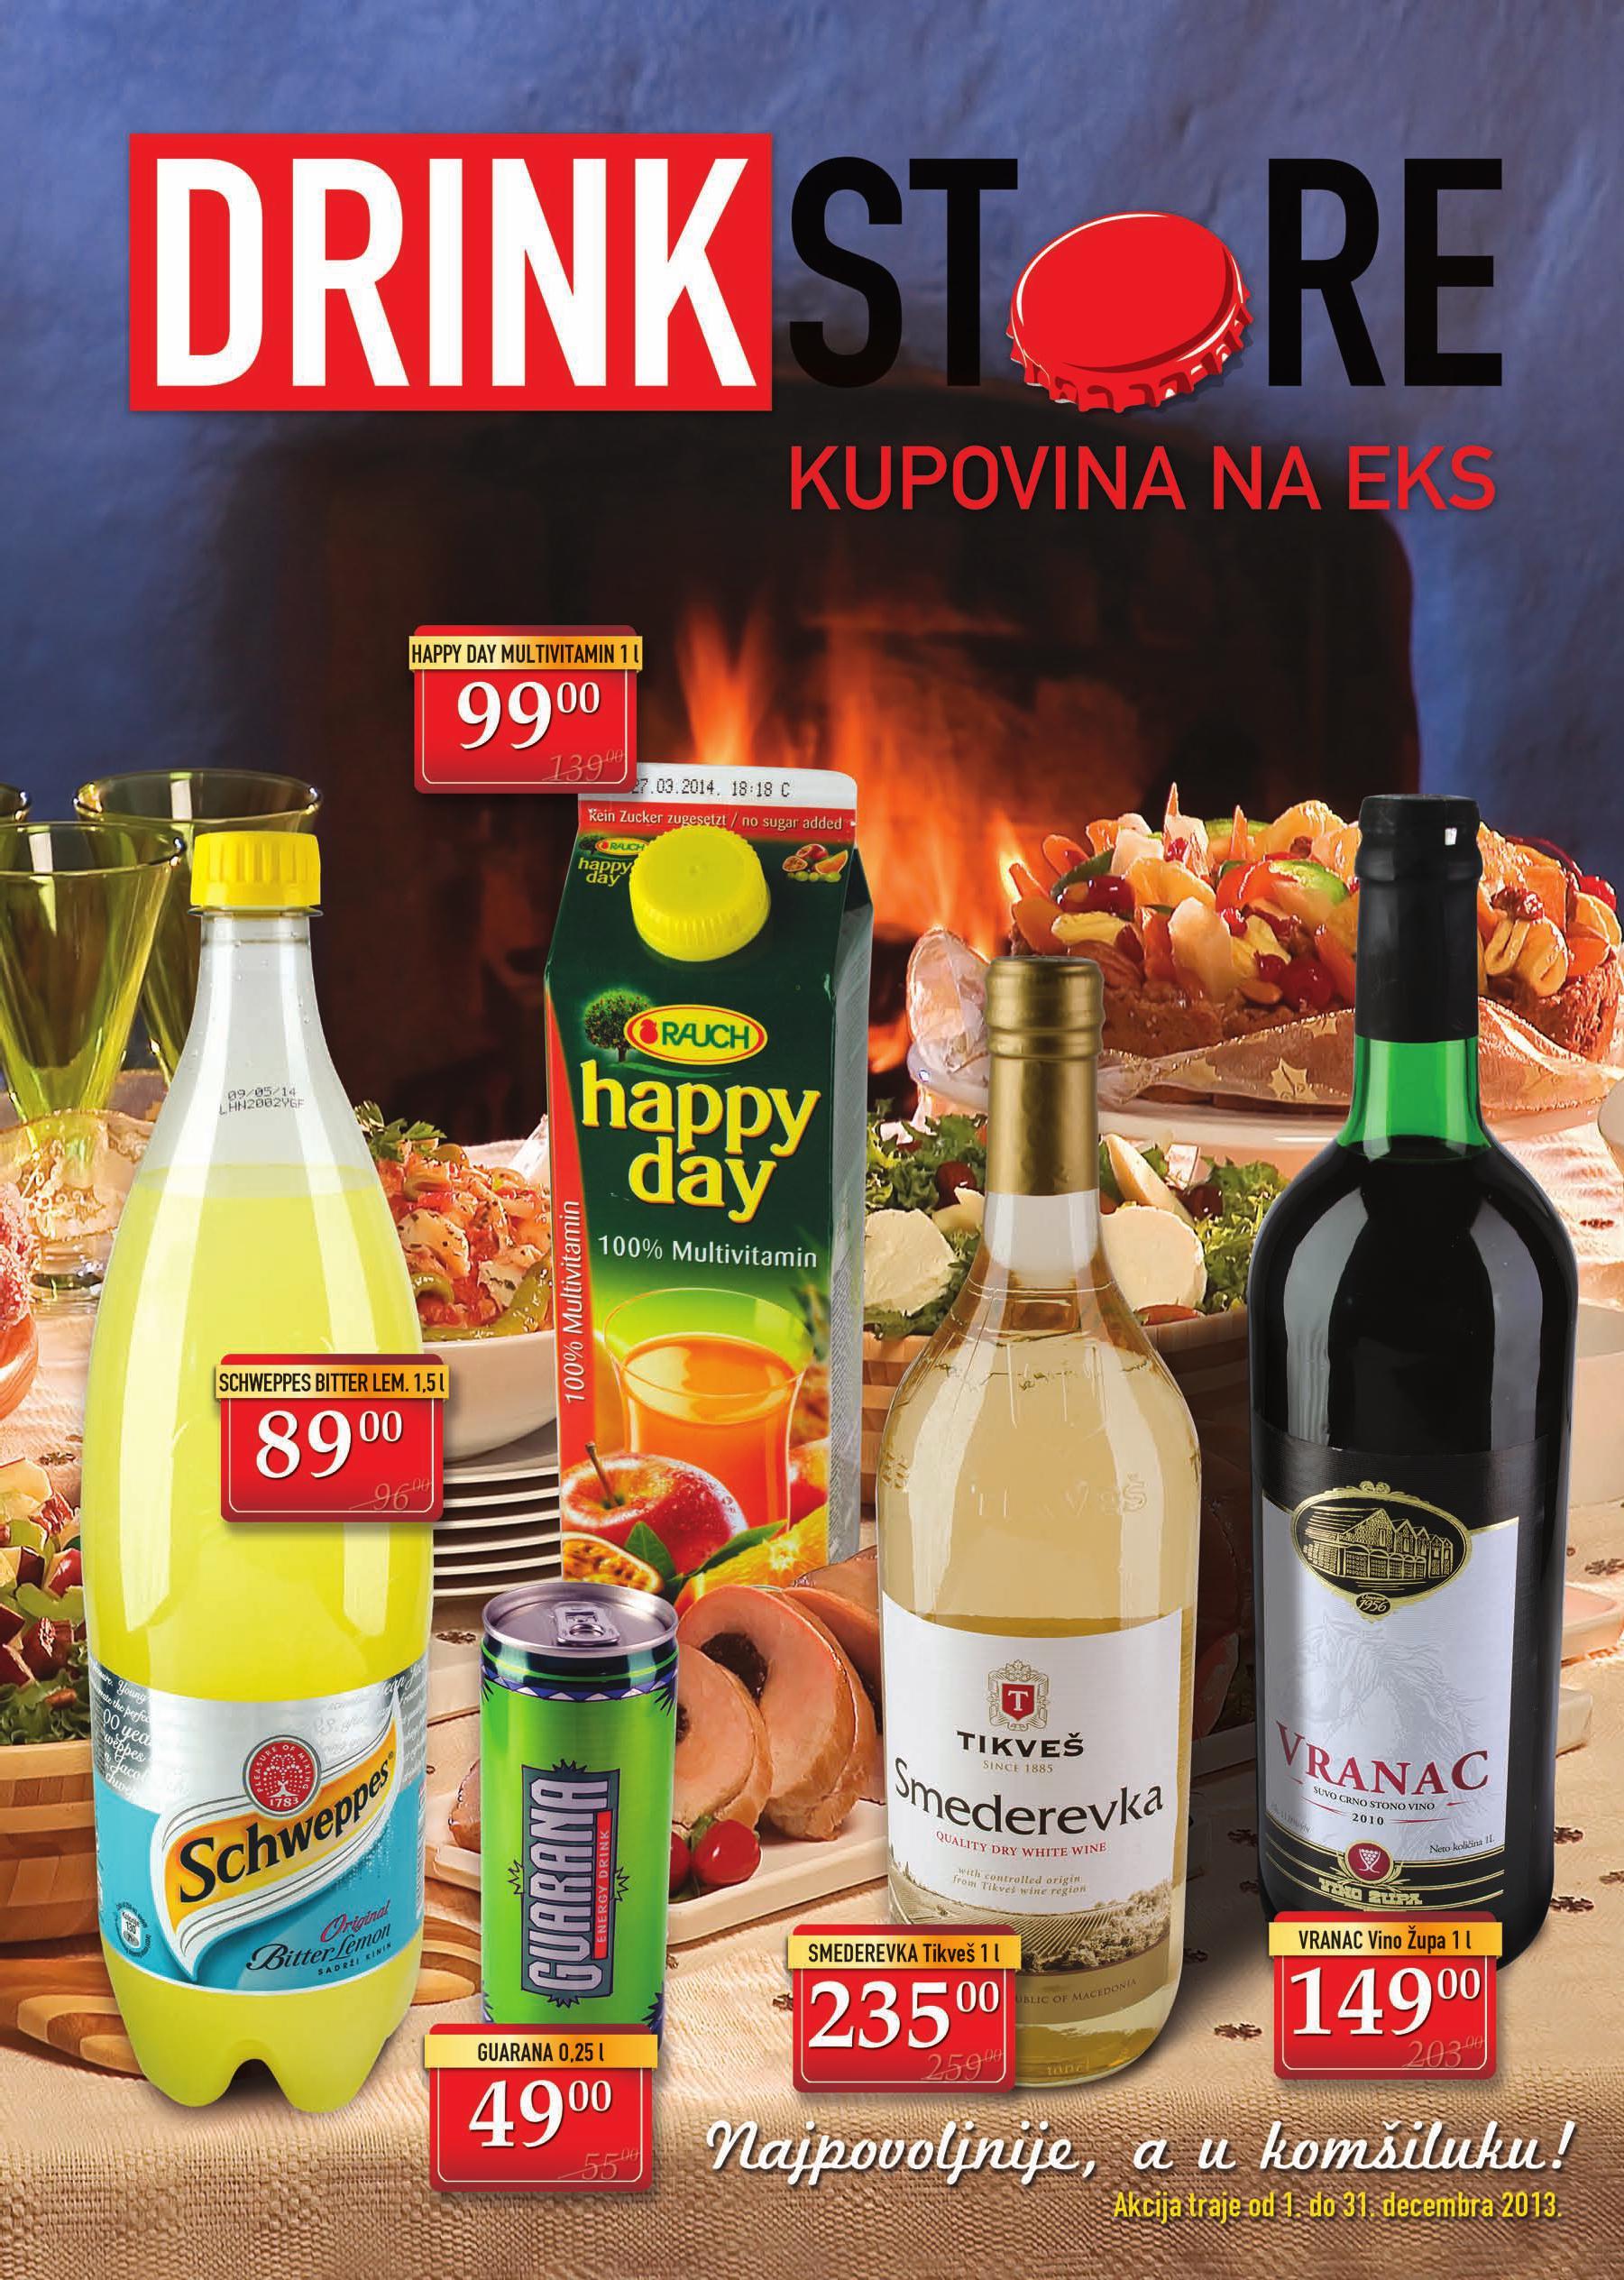 Drink Store katalog super cena